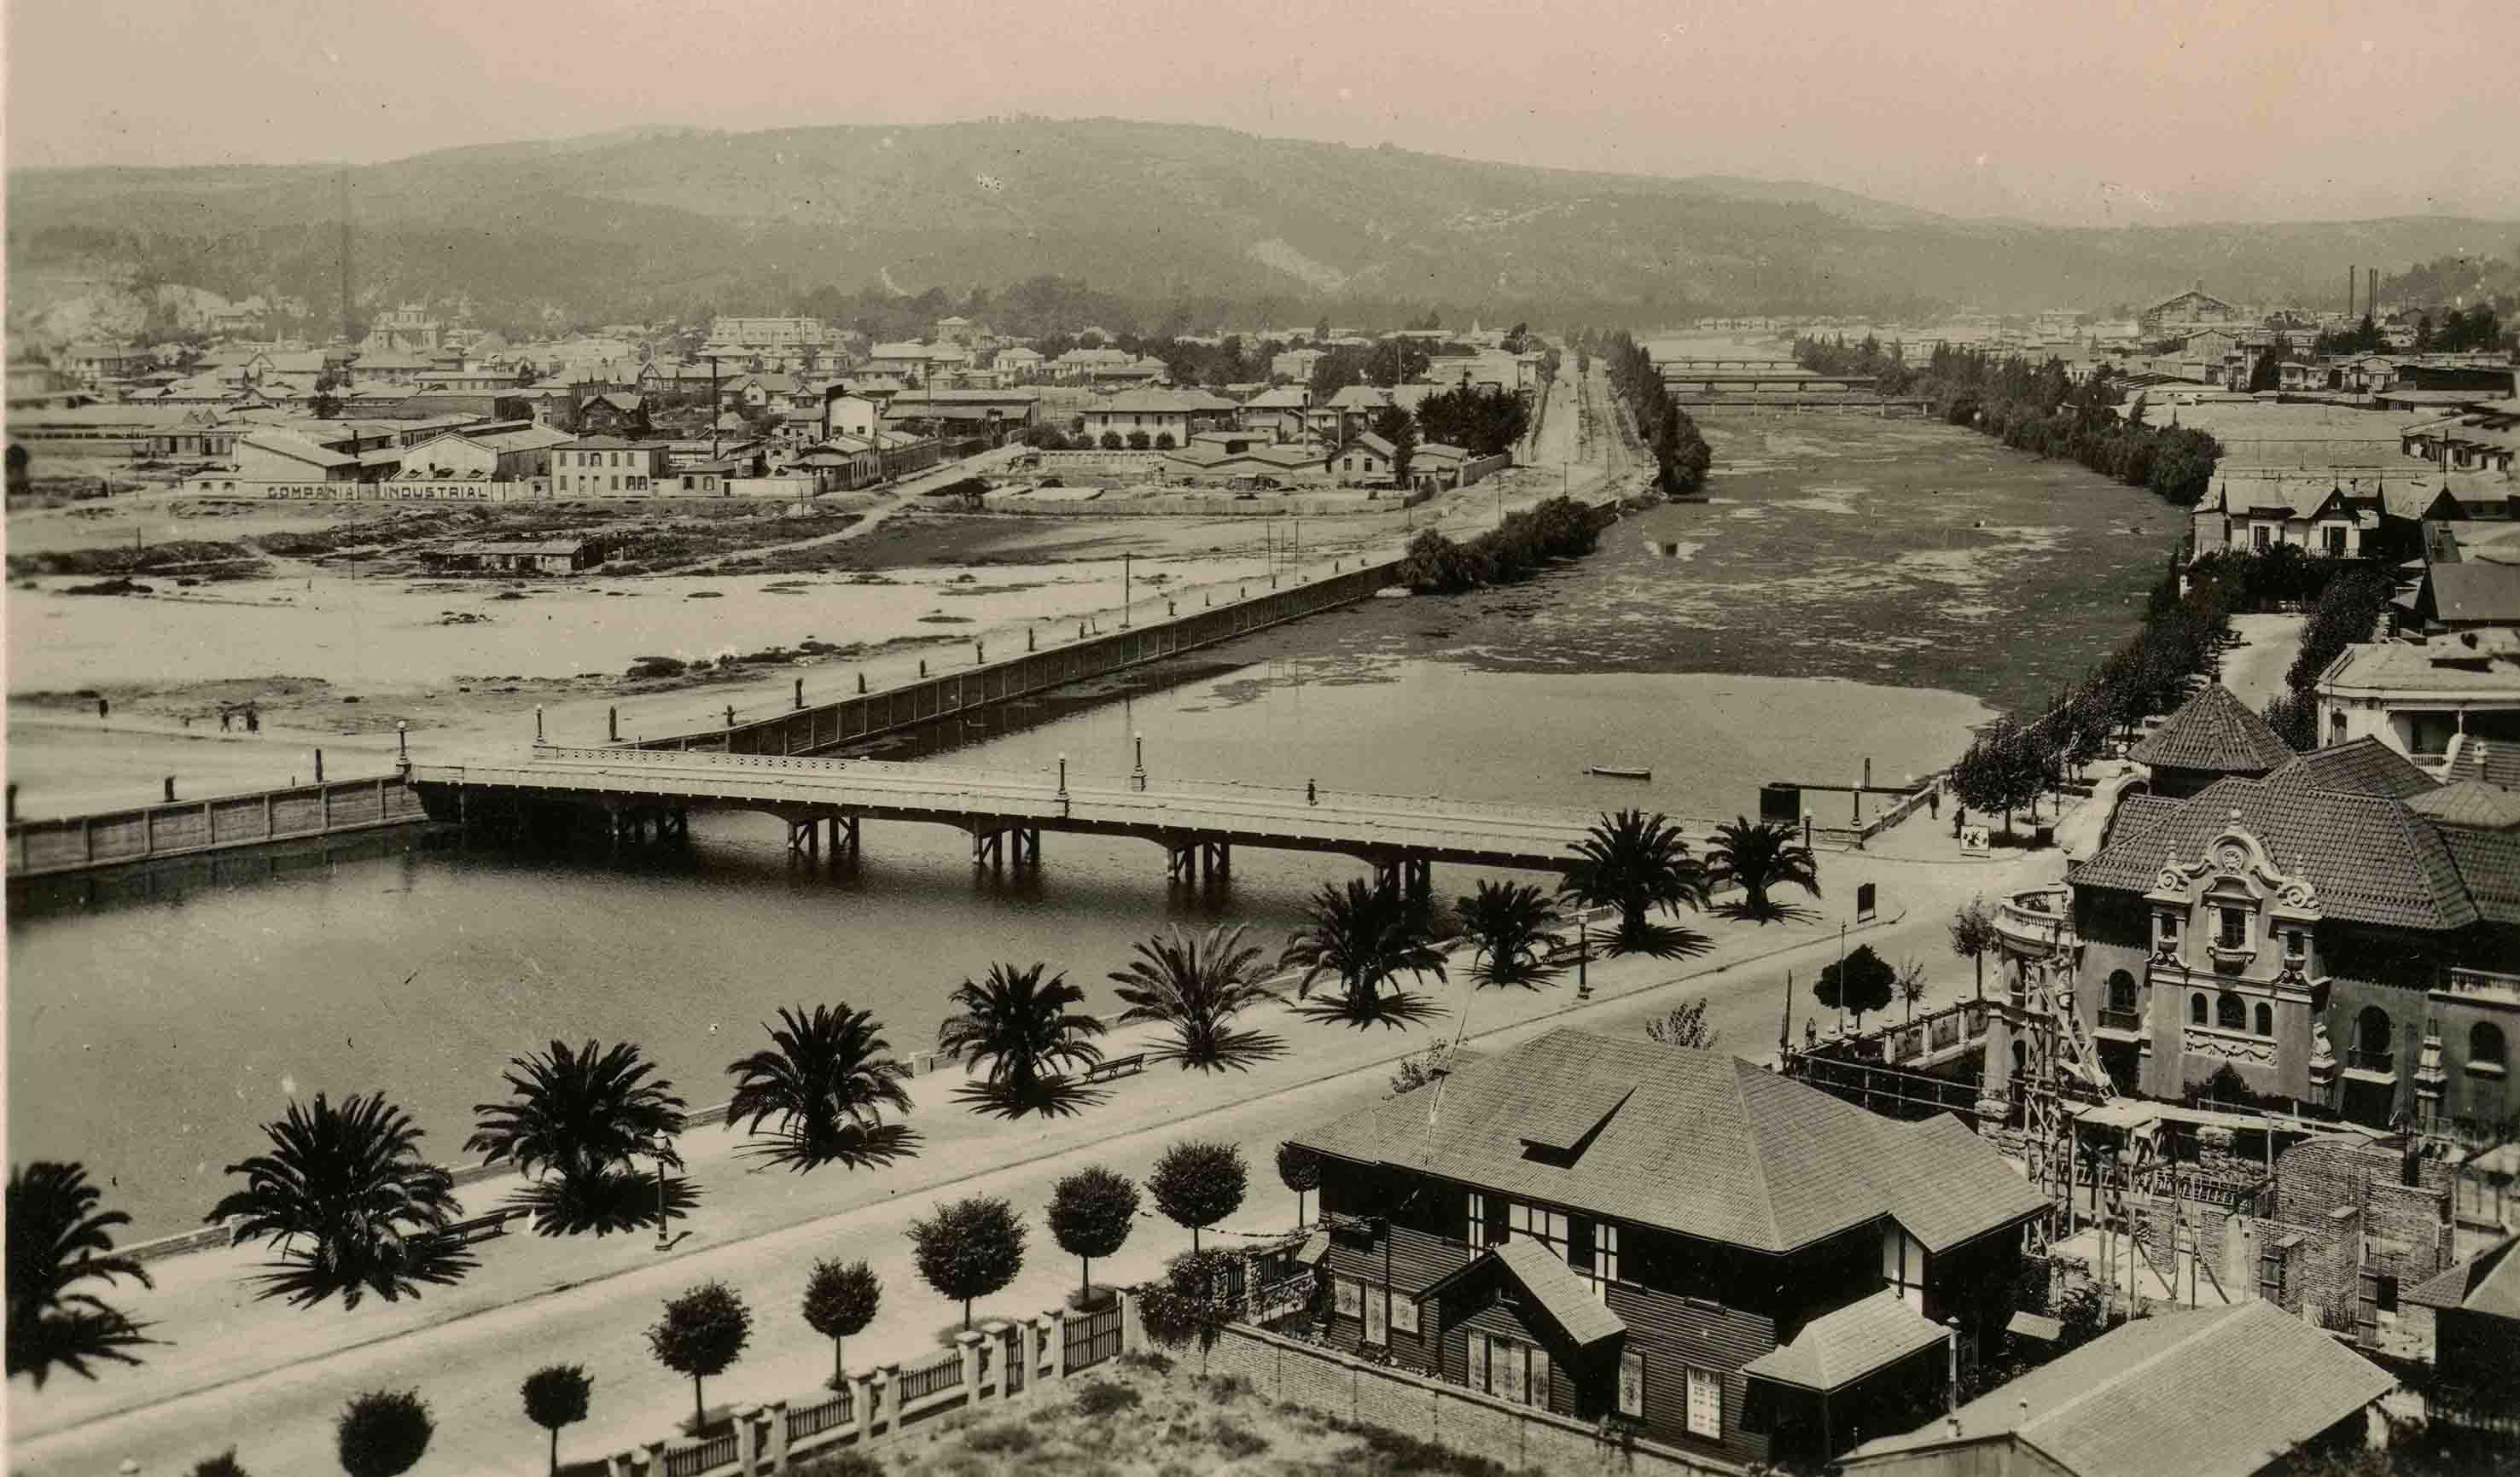 Enterreno - Fotos históricas de chile - fotos antiguas de Chile - Estero Marga Marga ca. 1925